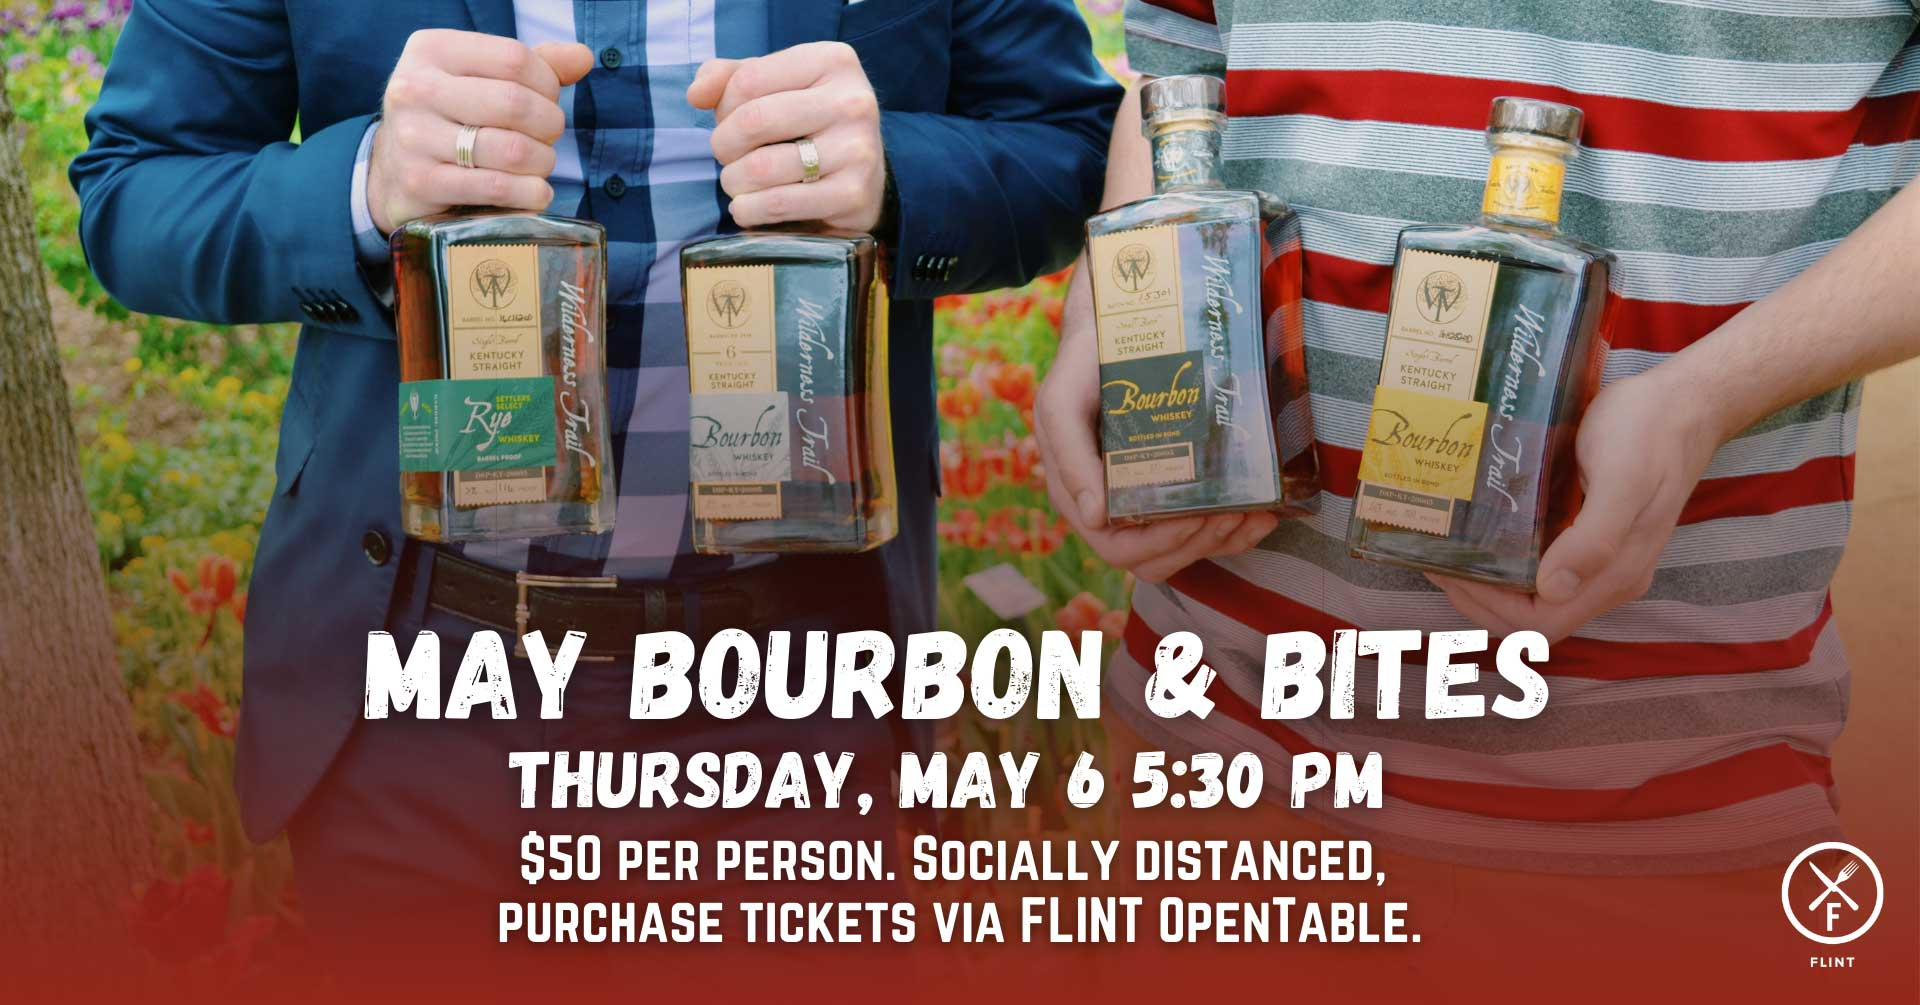 May Bourbon & Bites